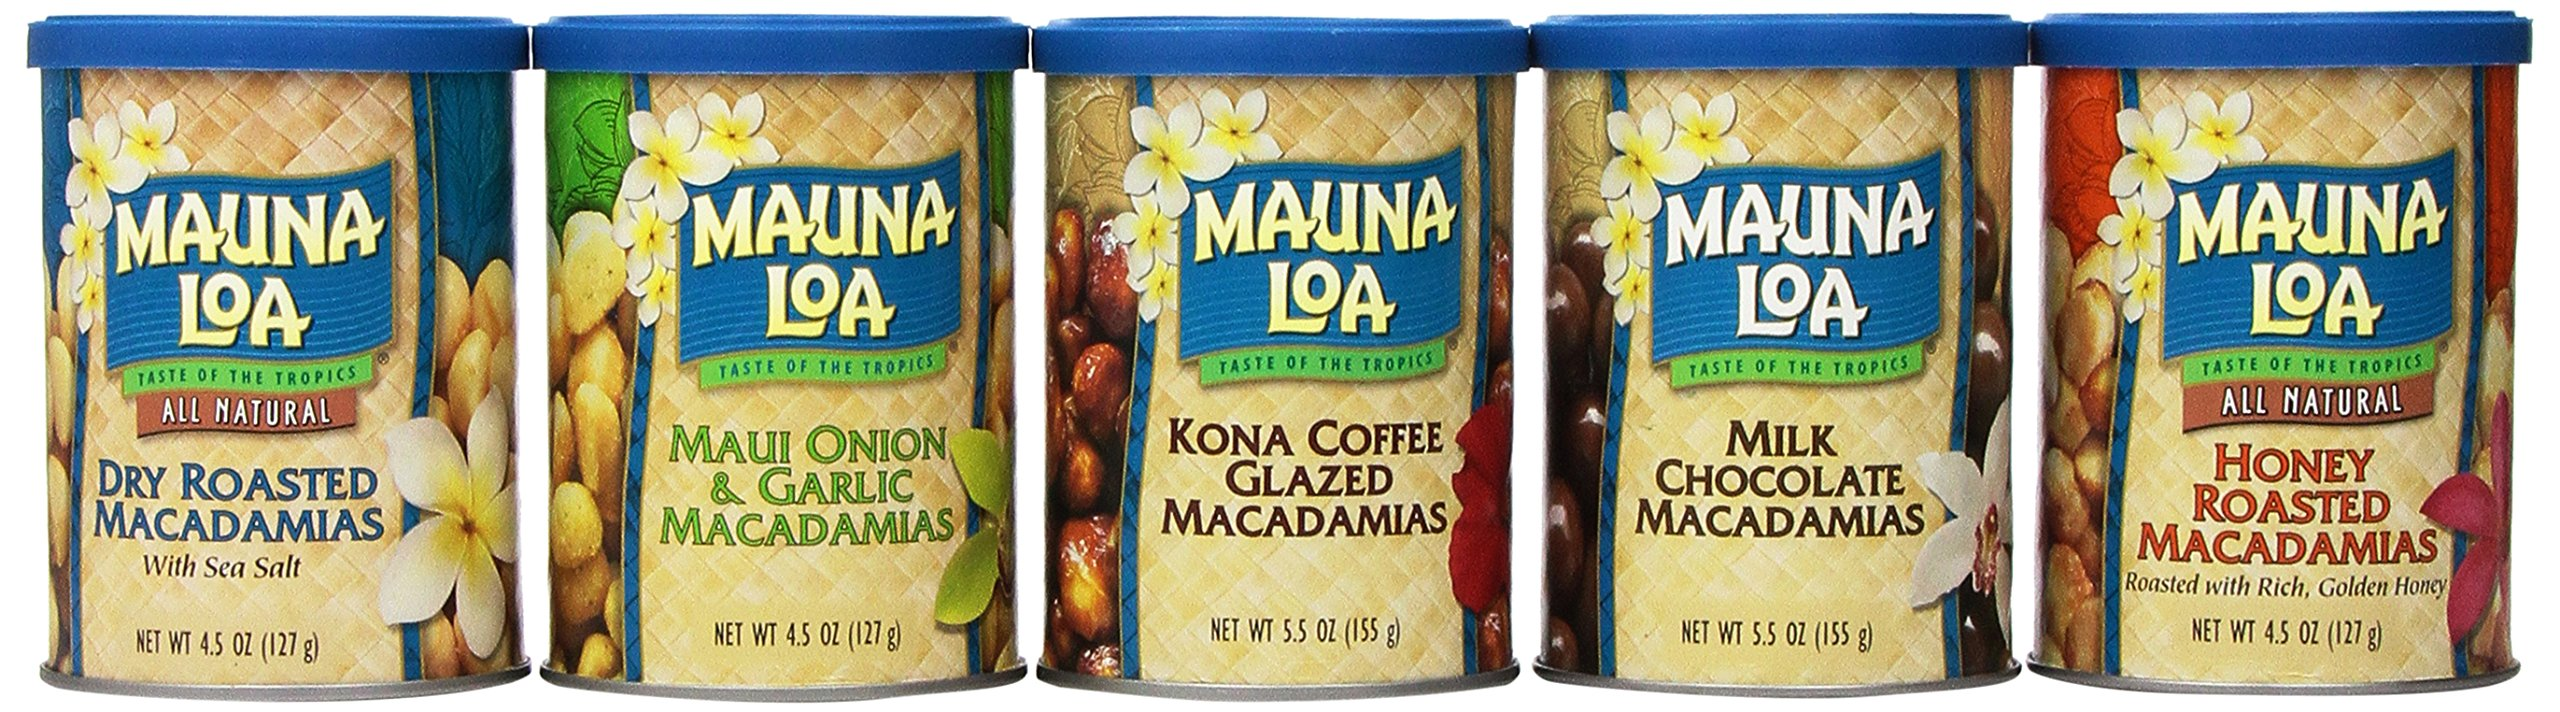 Mauna Loa Island Classics Assortment, 5.5 oz, 6-Count